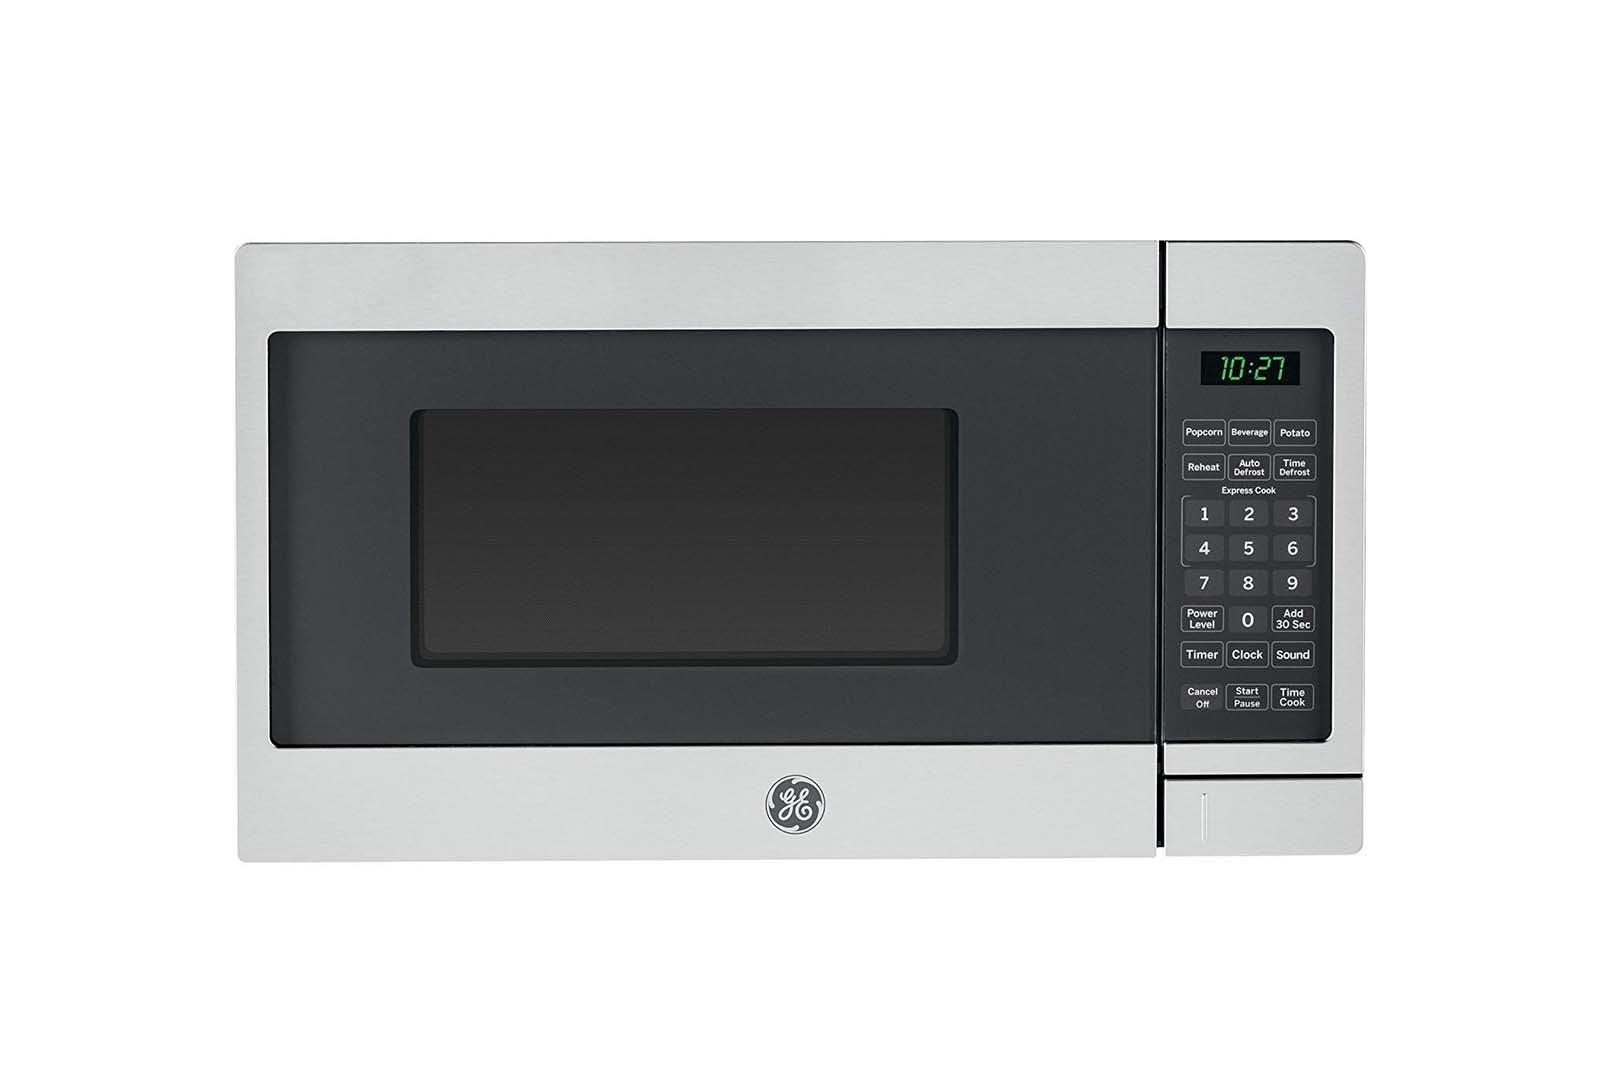 GE JES1072SHSS Microwave.